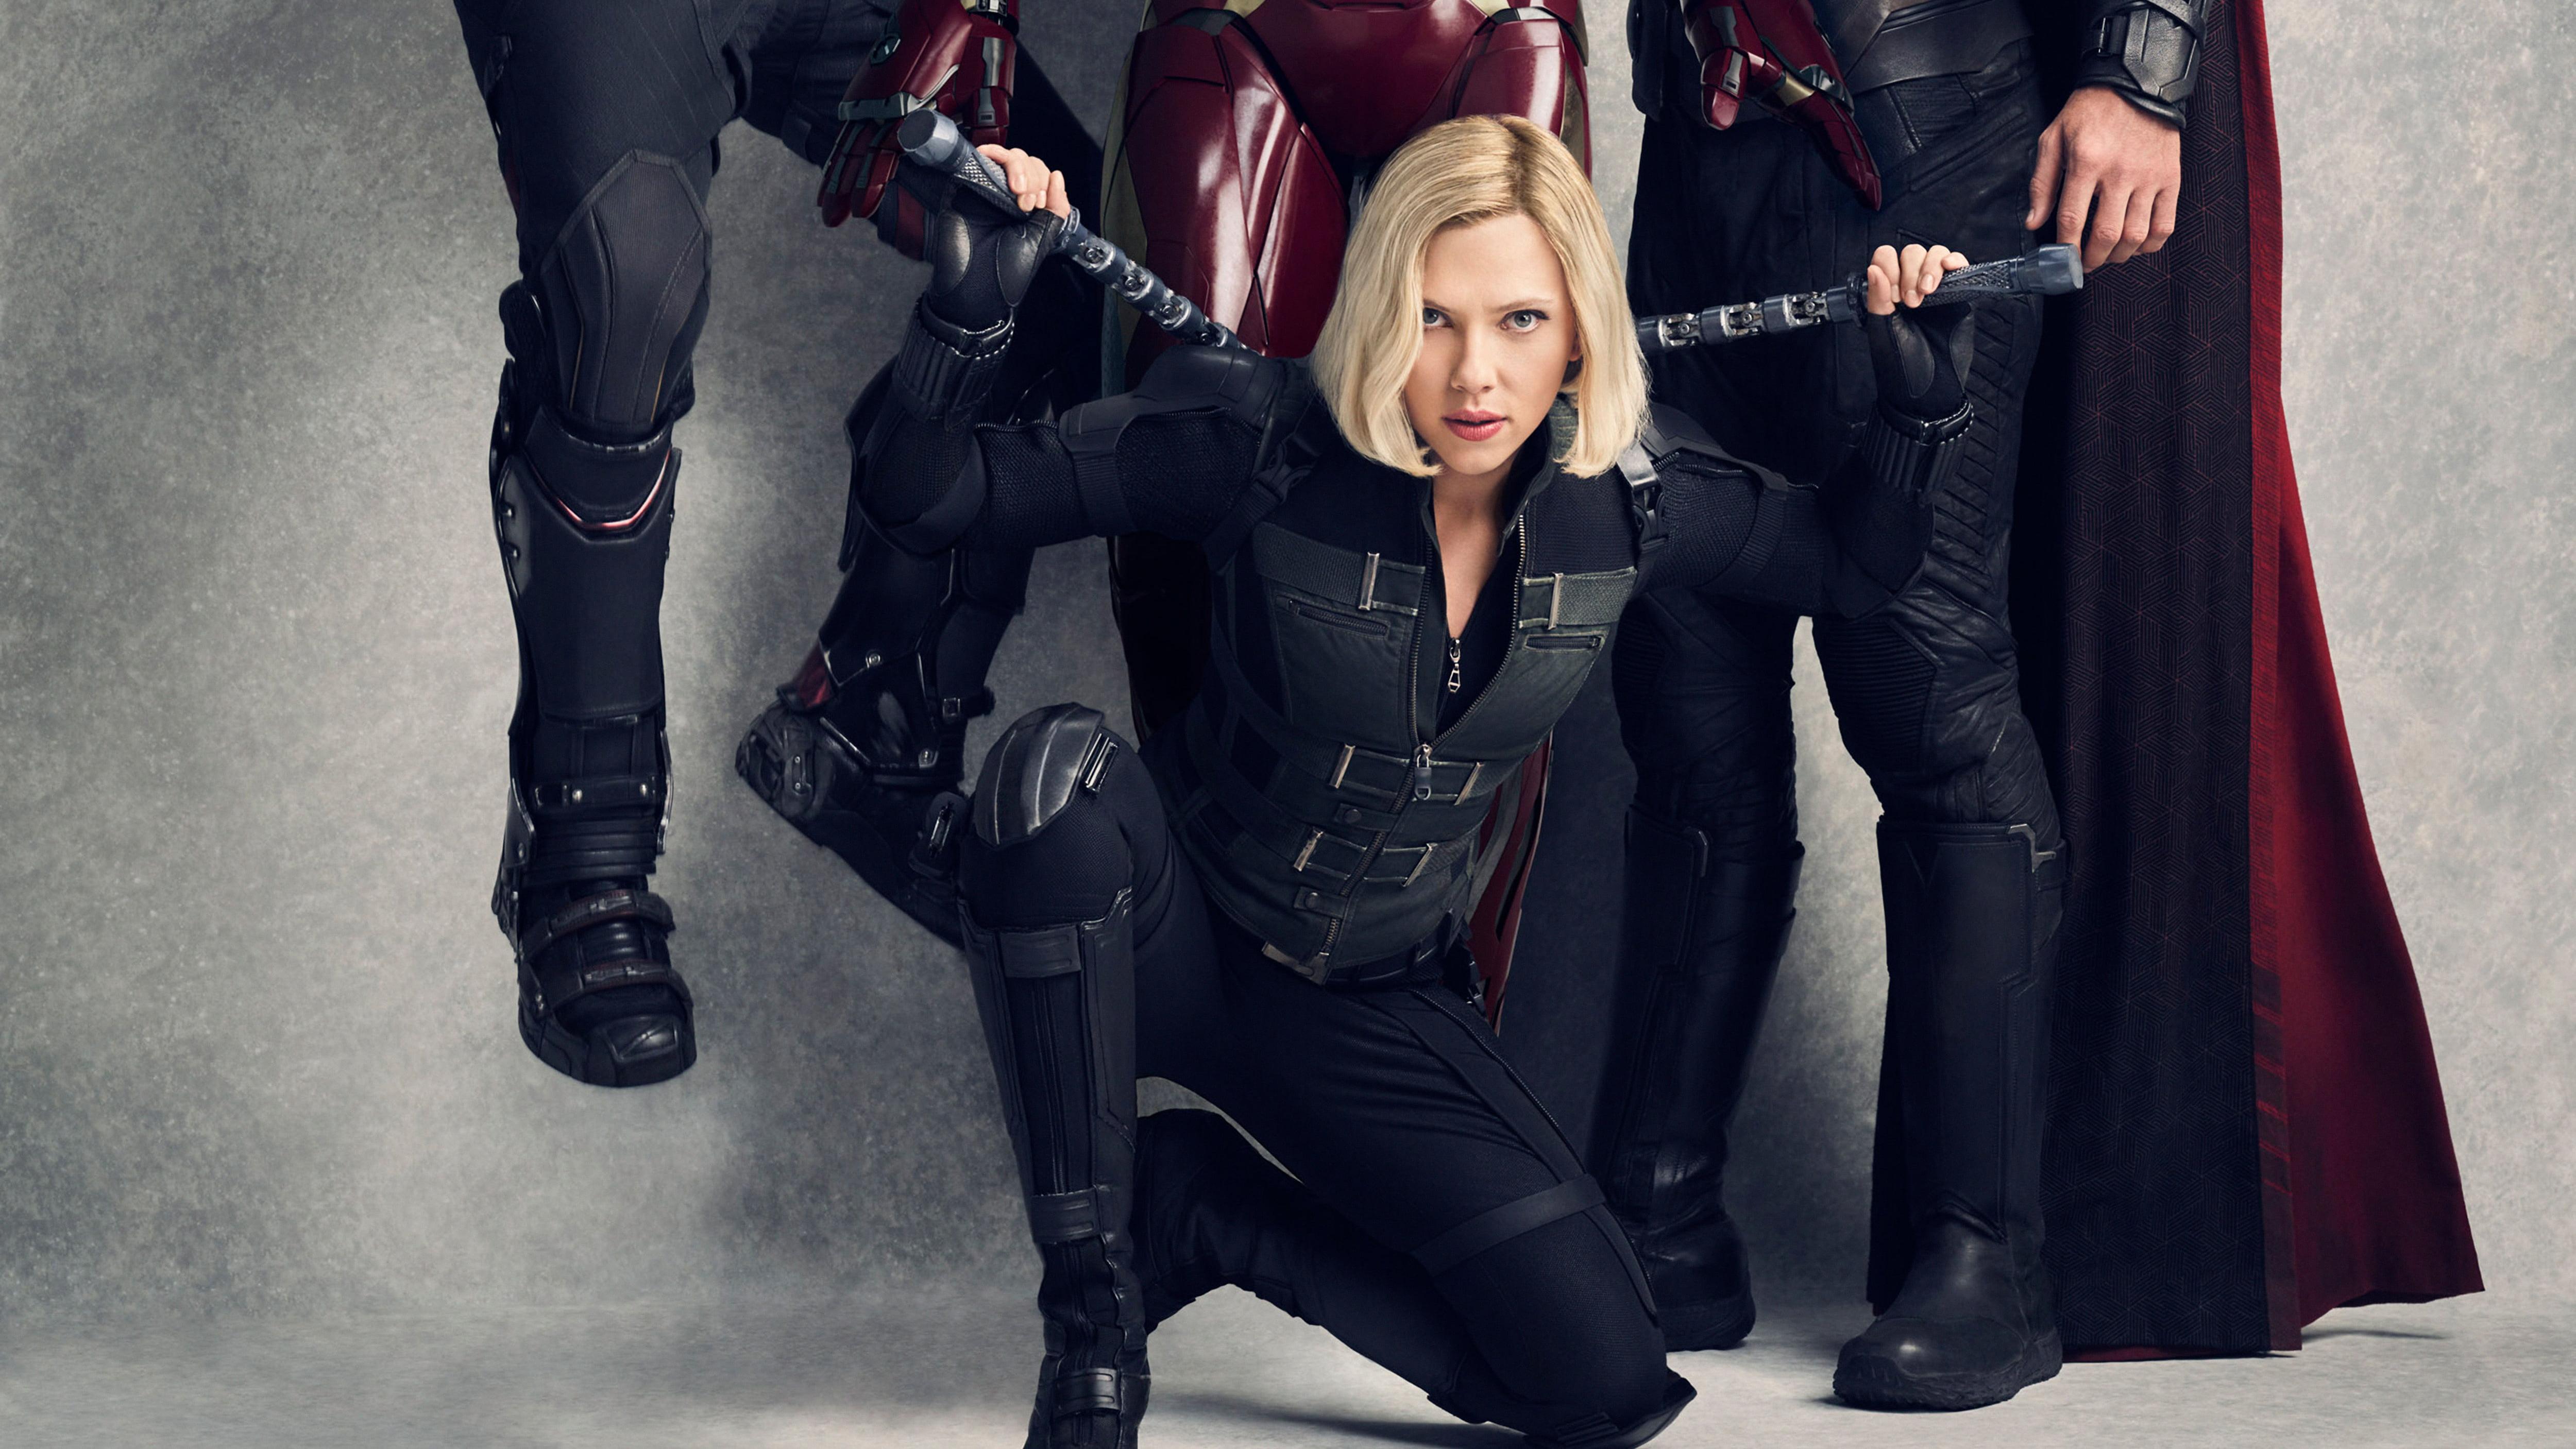 Infinity War Scarlett Johansson Natasha Romanoff Black Widow Infinity War 1502148 Hd Wallpaper Backgrounds Download